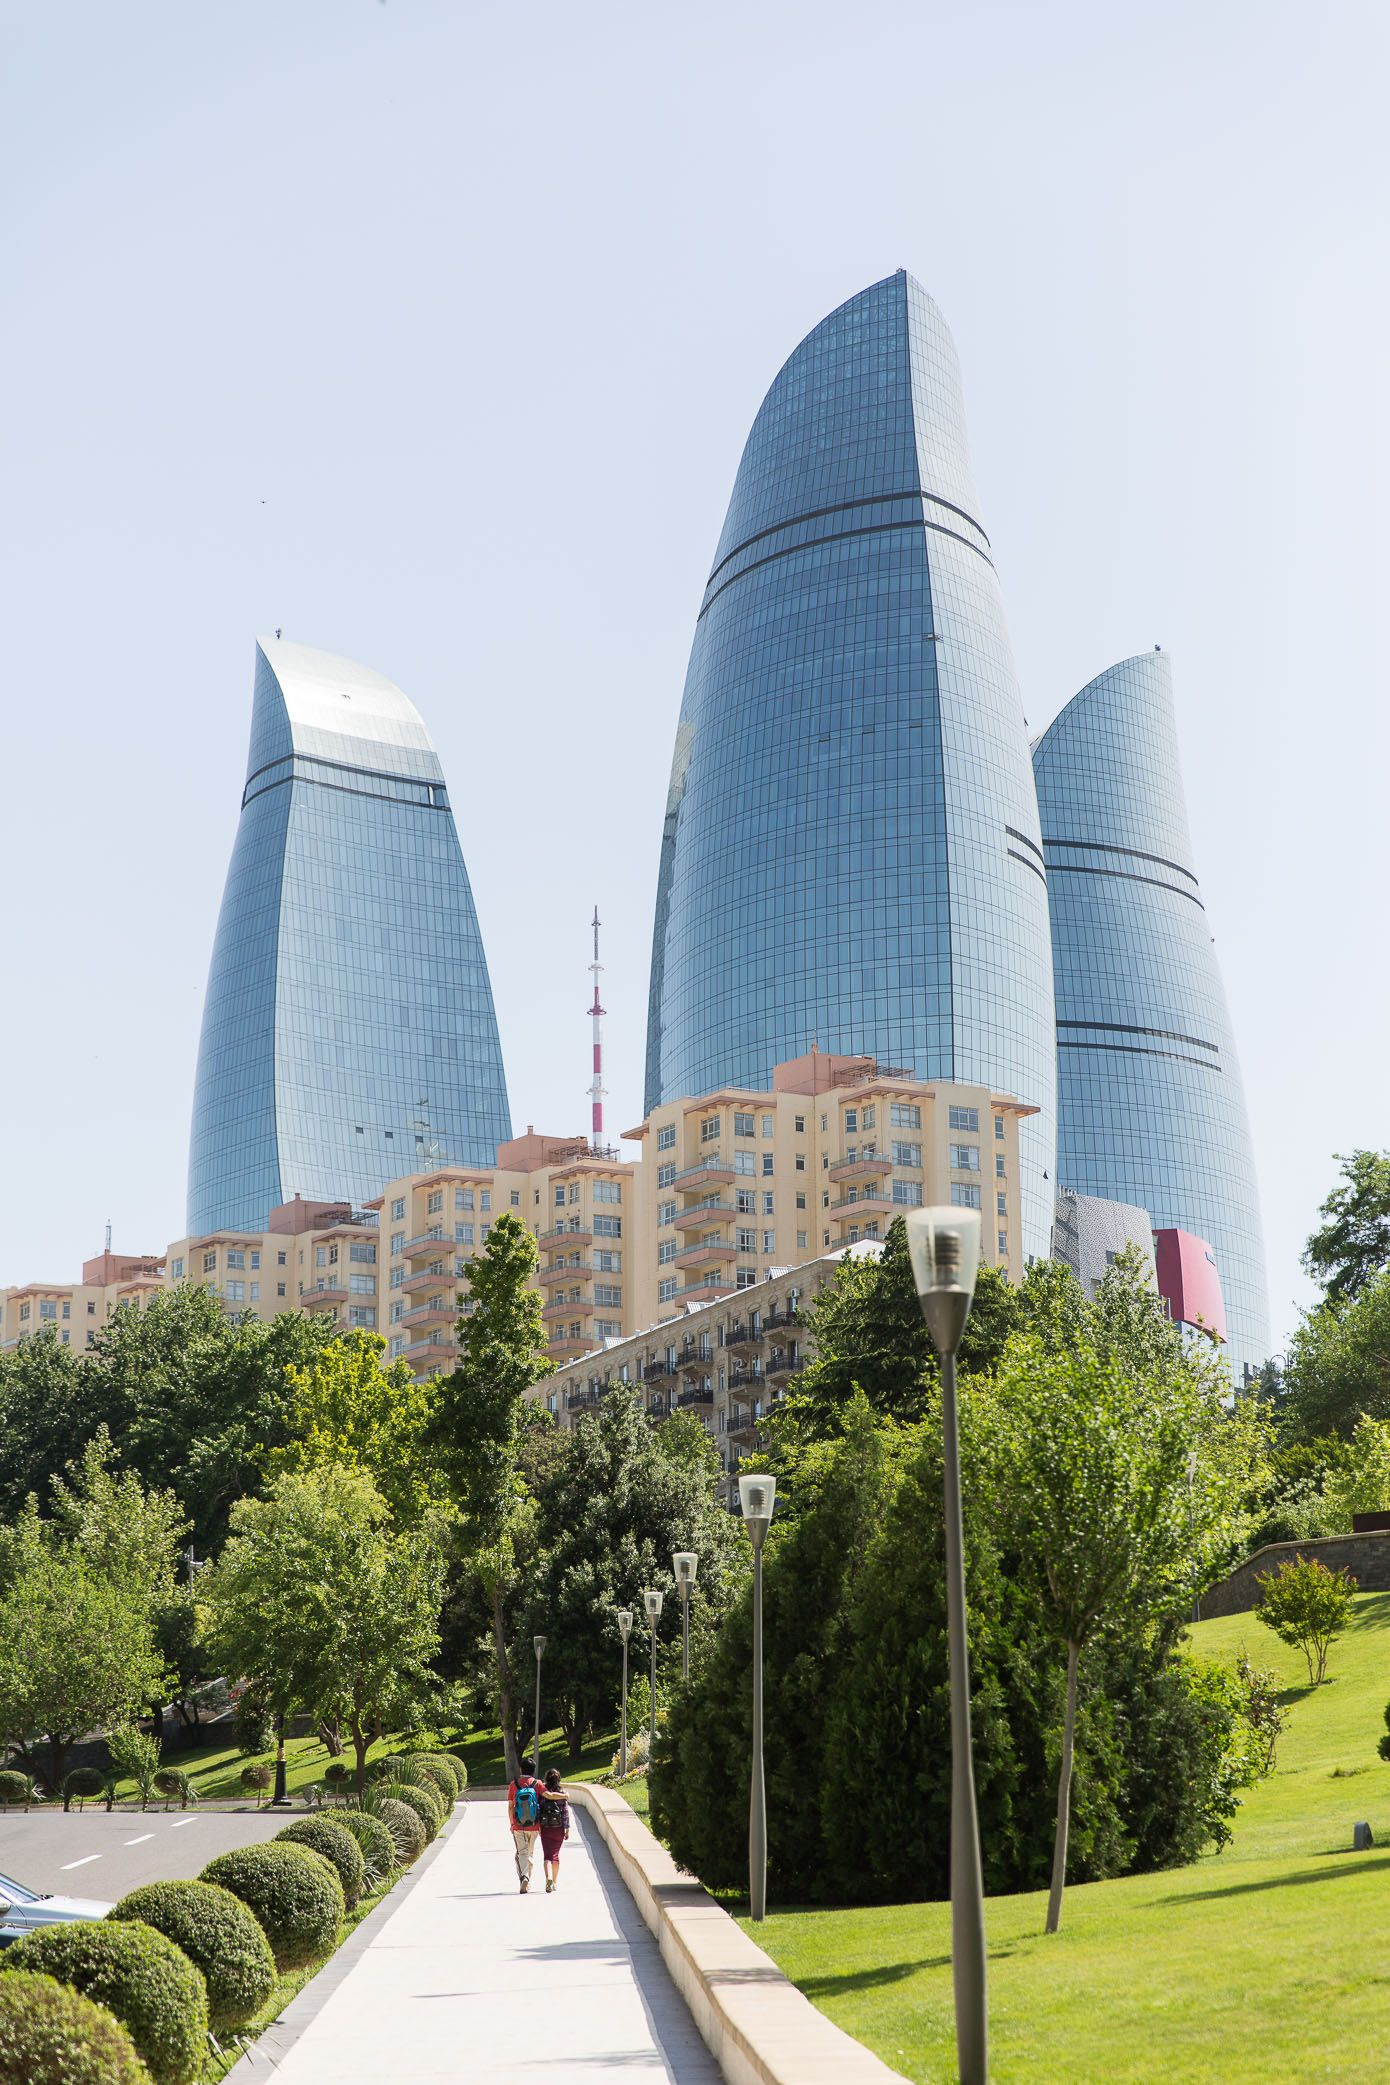 Flames Without Dust The Fairmont Hotel Baku The Lionheaded Baku Azerbaijan Baku City Azerbaijan Travel